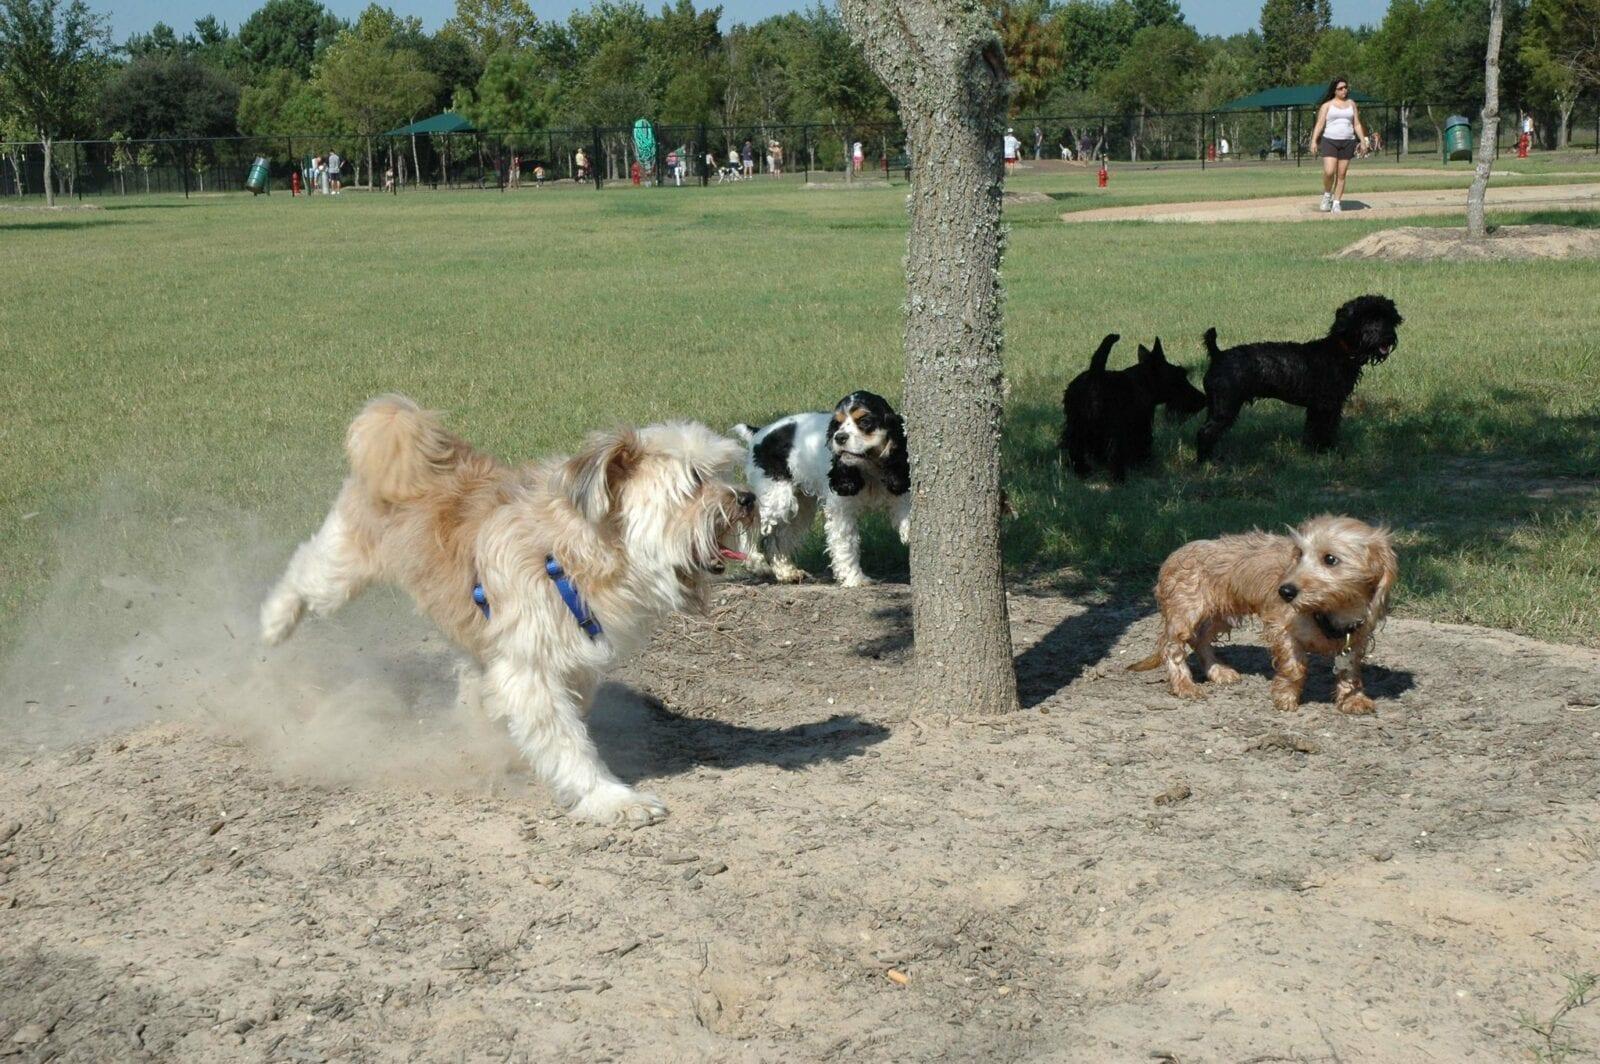 Image of dog plays in the bear creek regional park dog park in colorado springs, colorado